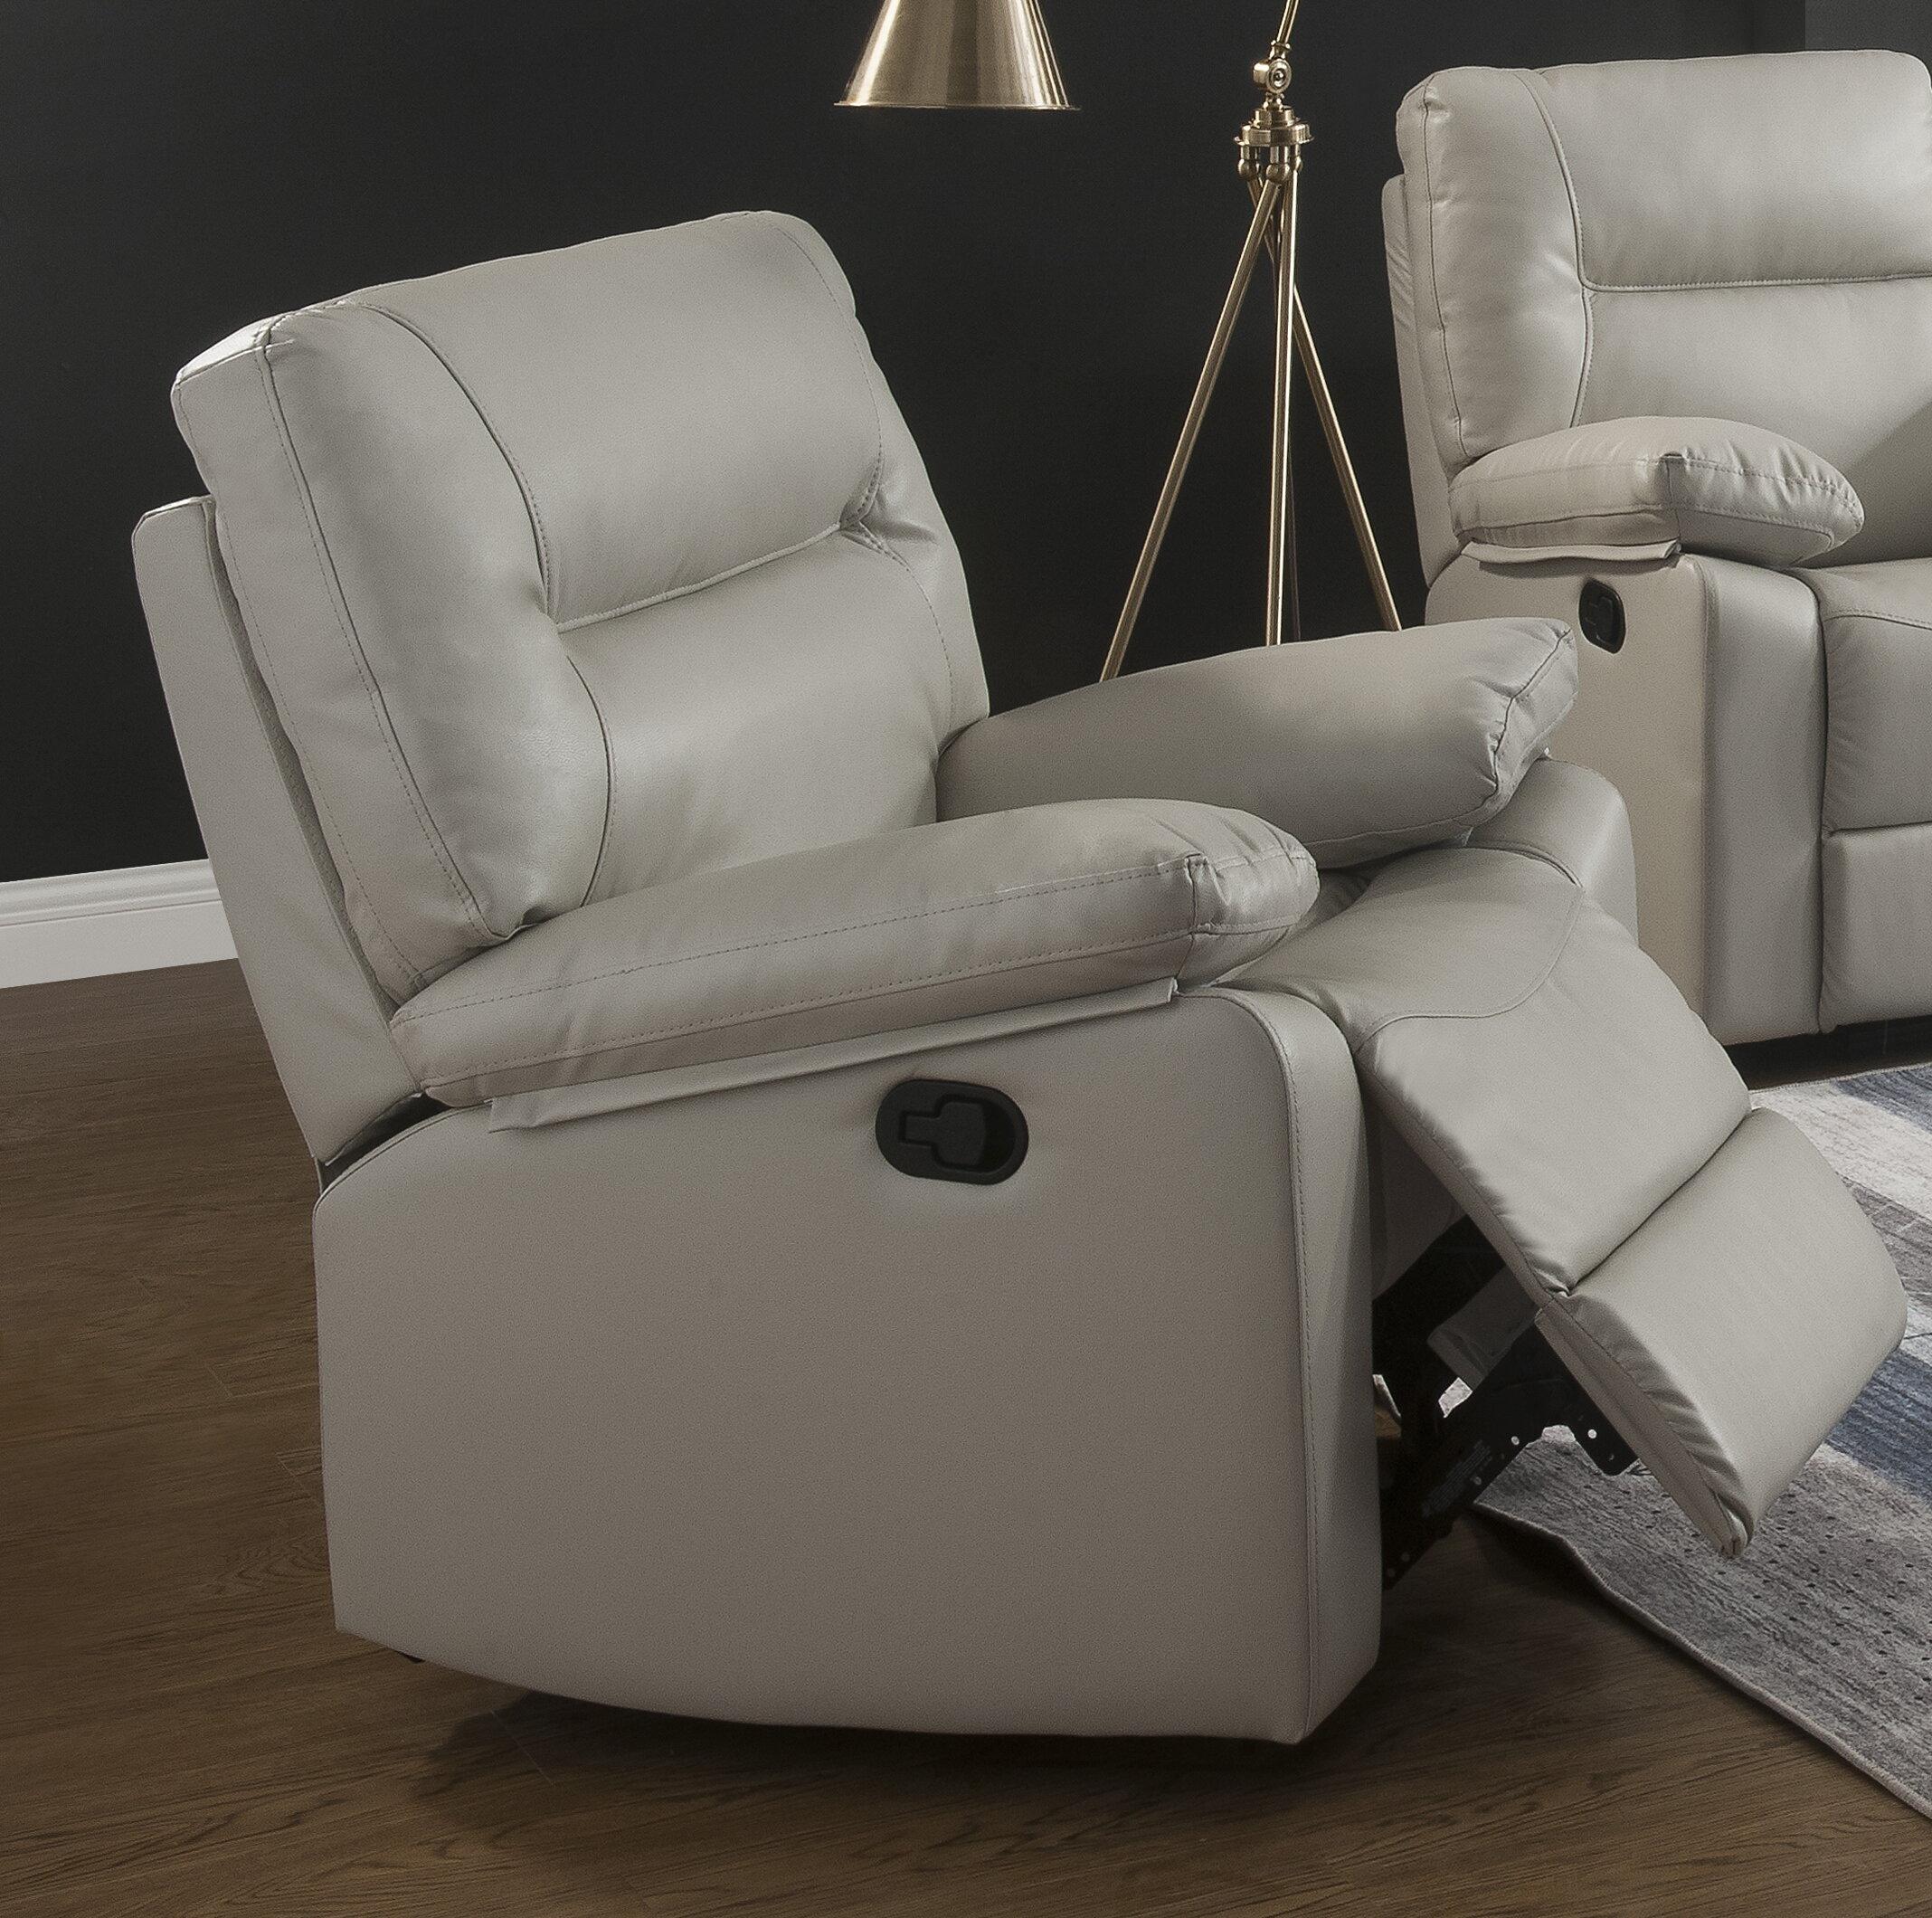 Super Larrabee Manual Rocker Recliner Creativecarmelina Interior Chair Design Creativecarmelinacom